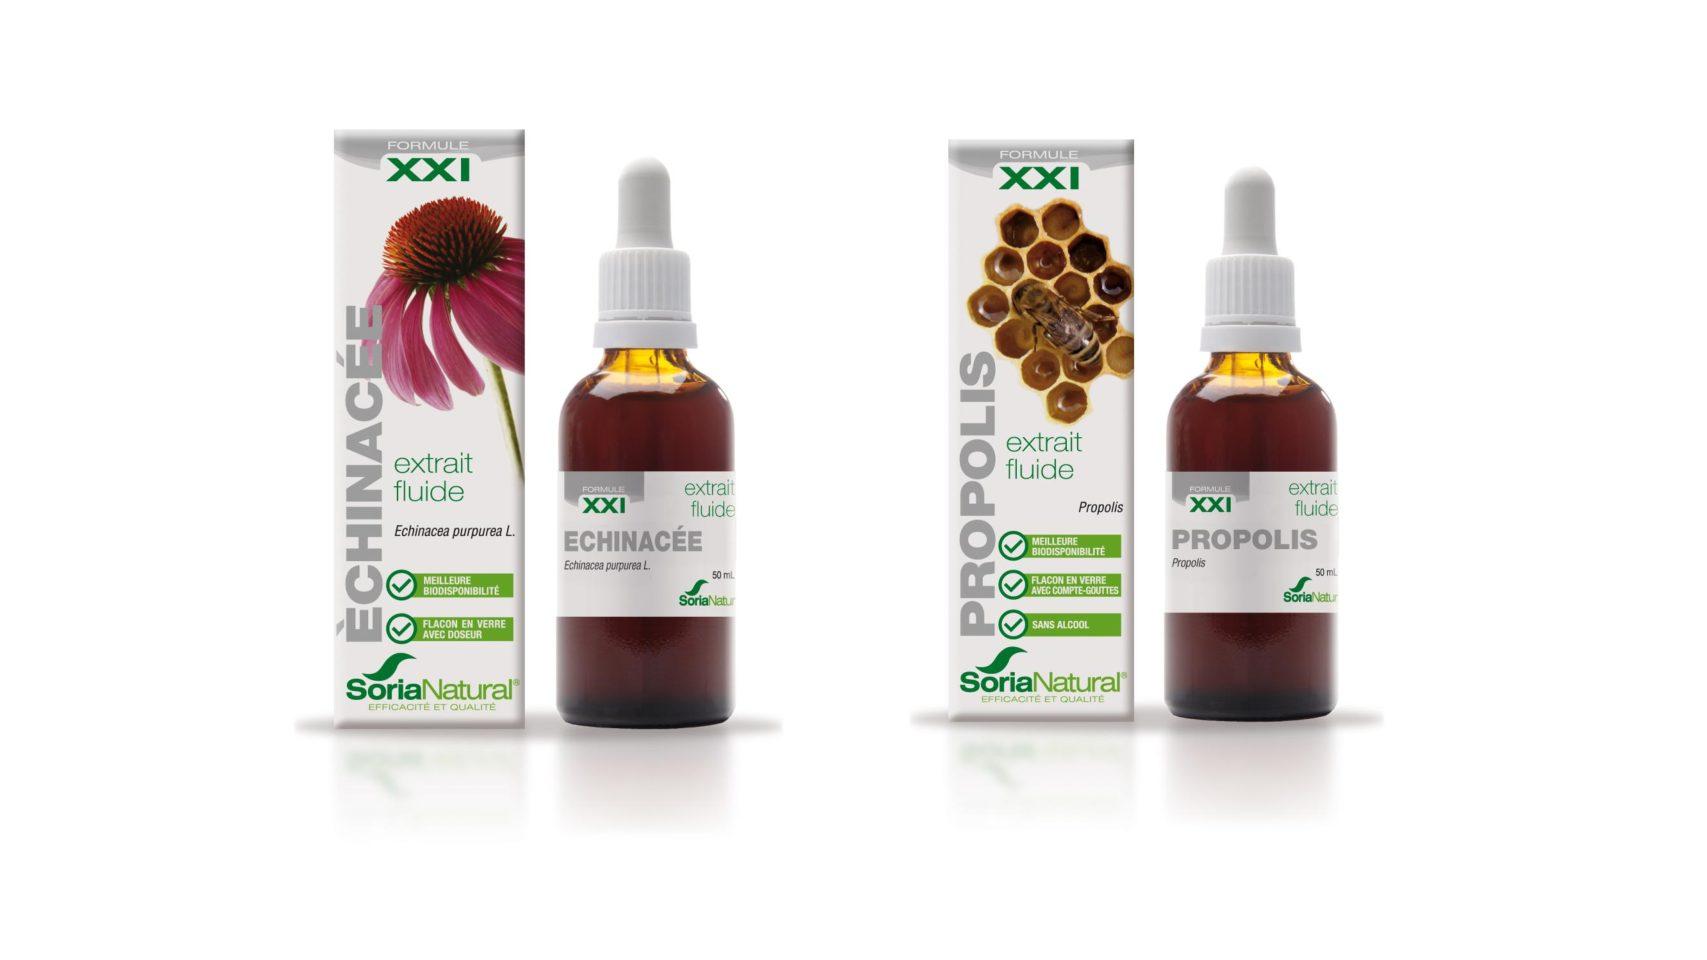 pack immunité echinacée-propolis